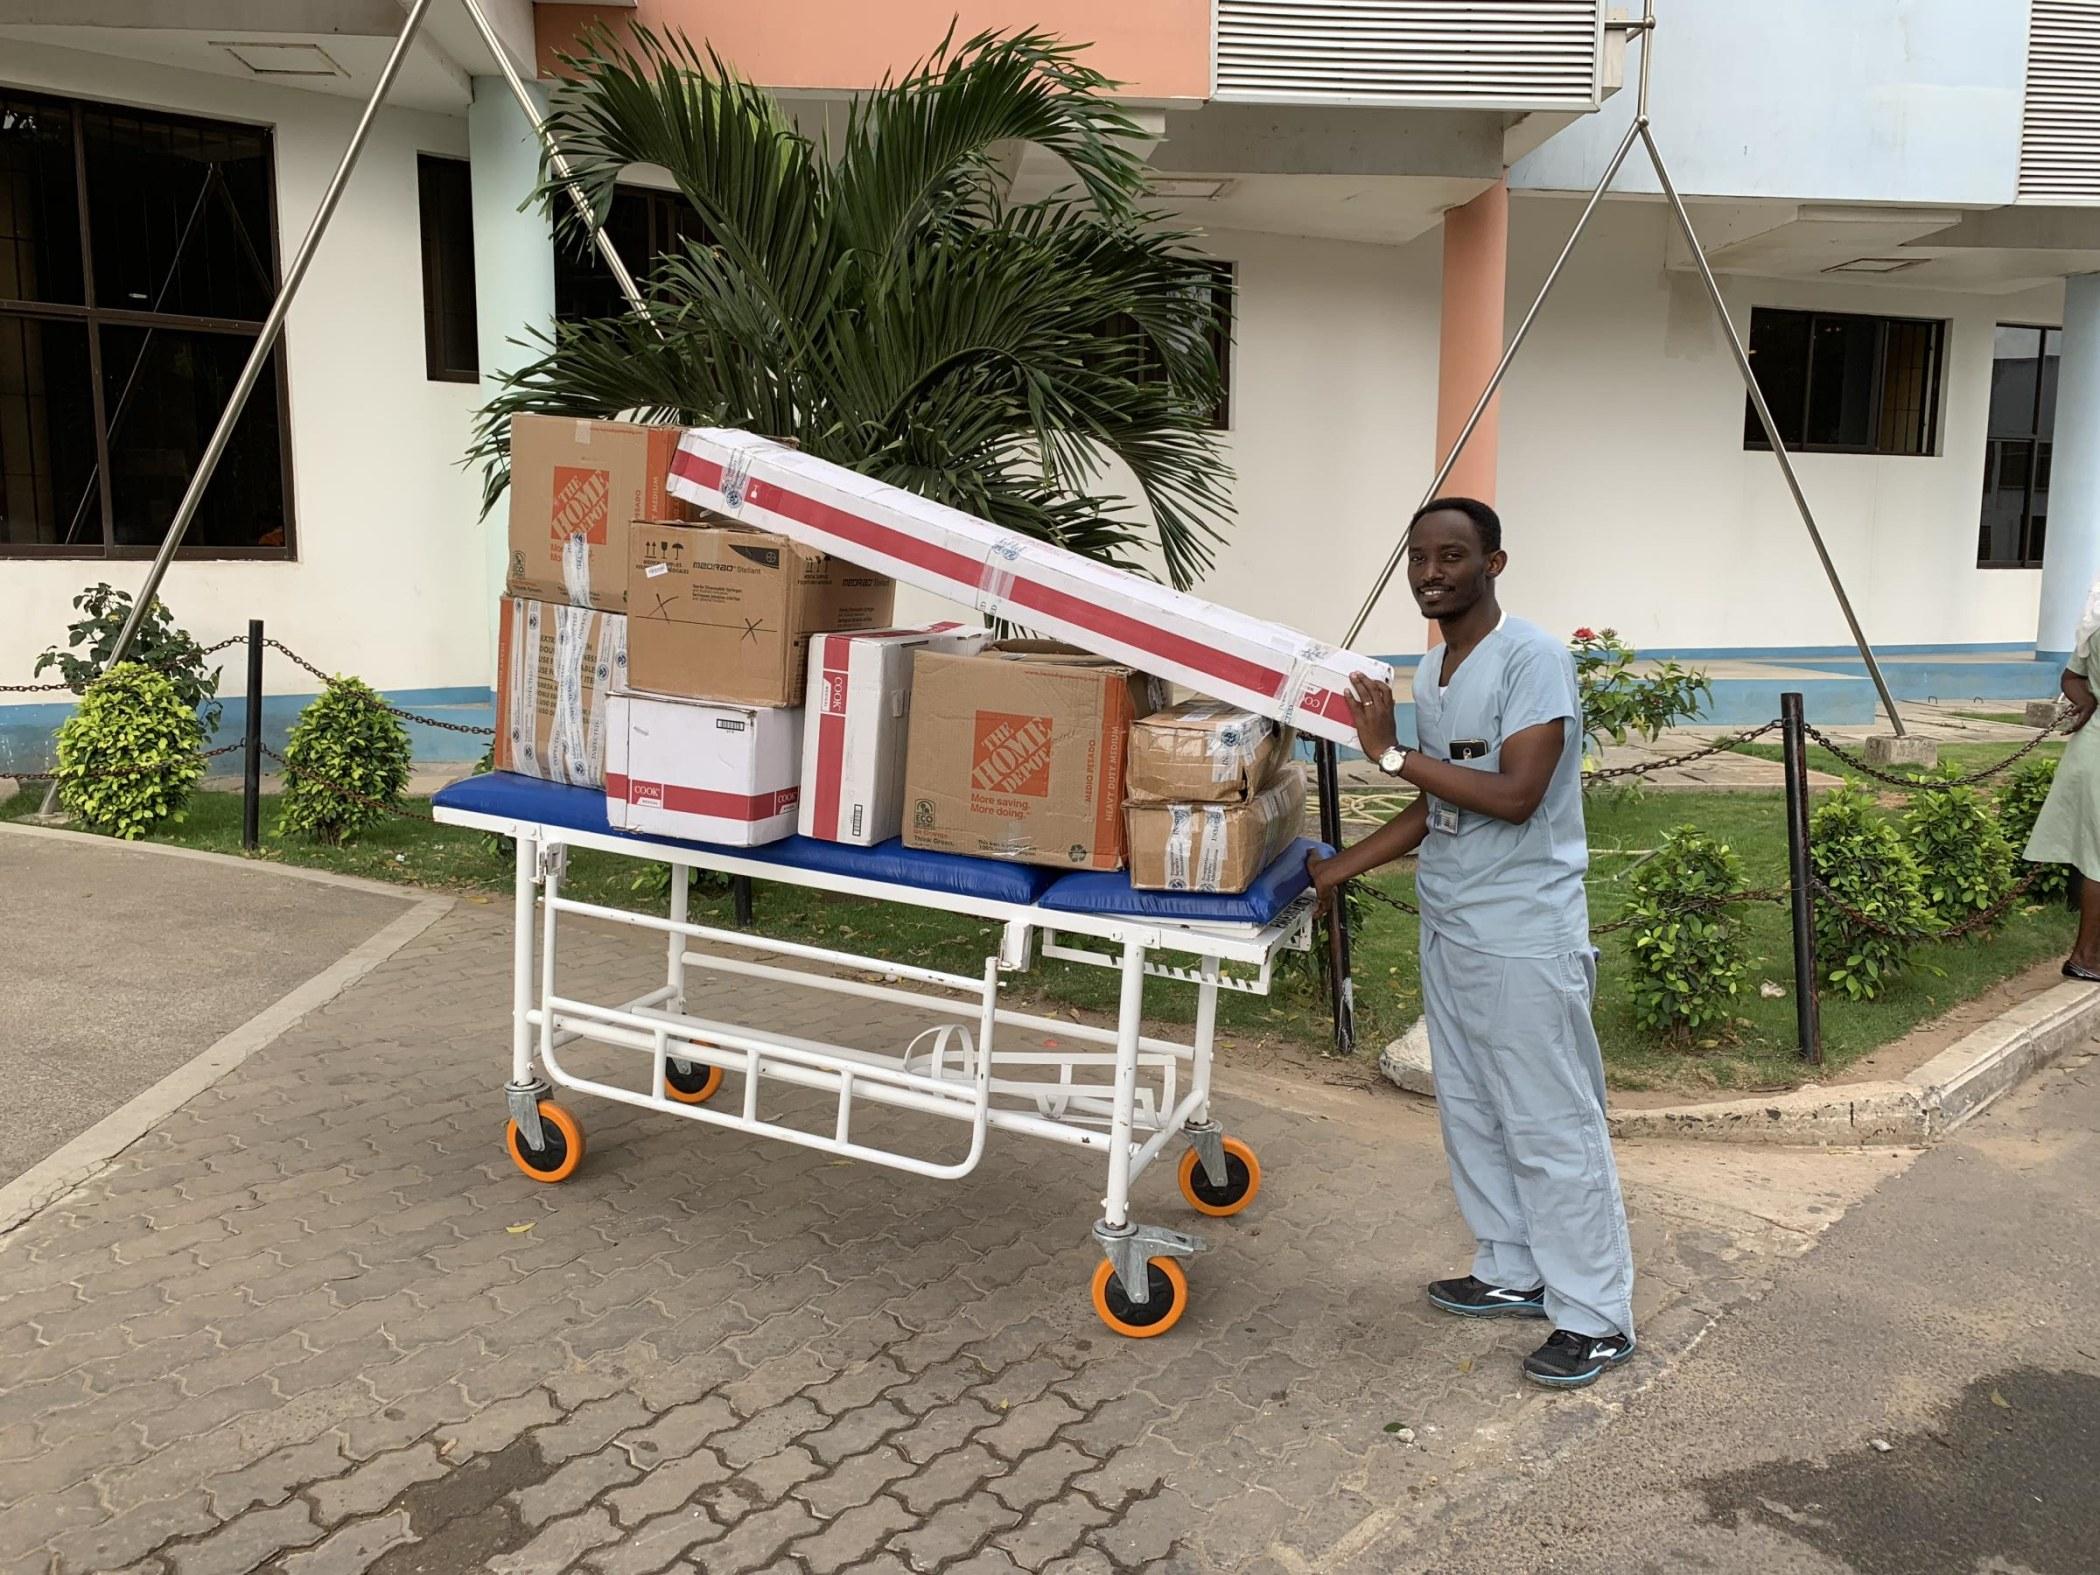 Dr. Ivan Rukundo transporting IR equipment to the procedure area.